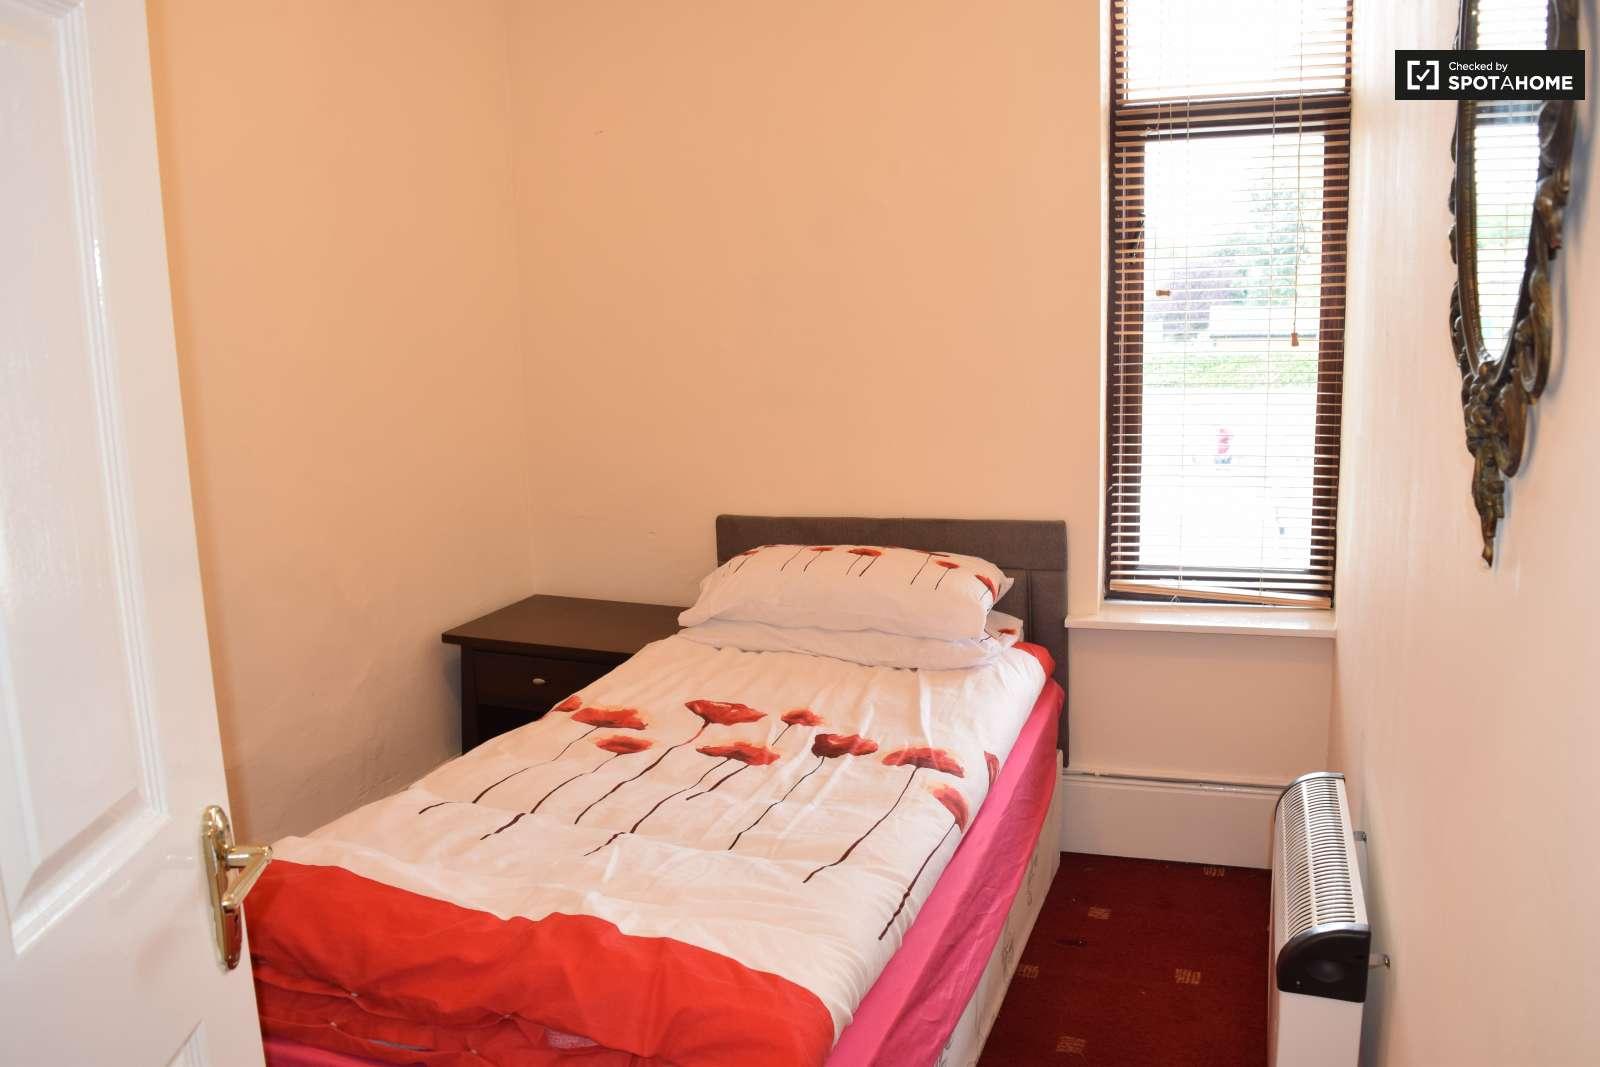 Pics Of Bedroom Rooms To Rent In 3 Bedroom House In Stoneybatter In Dublin Spotahome